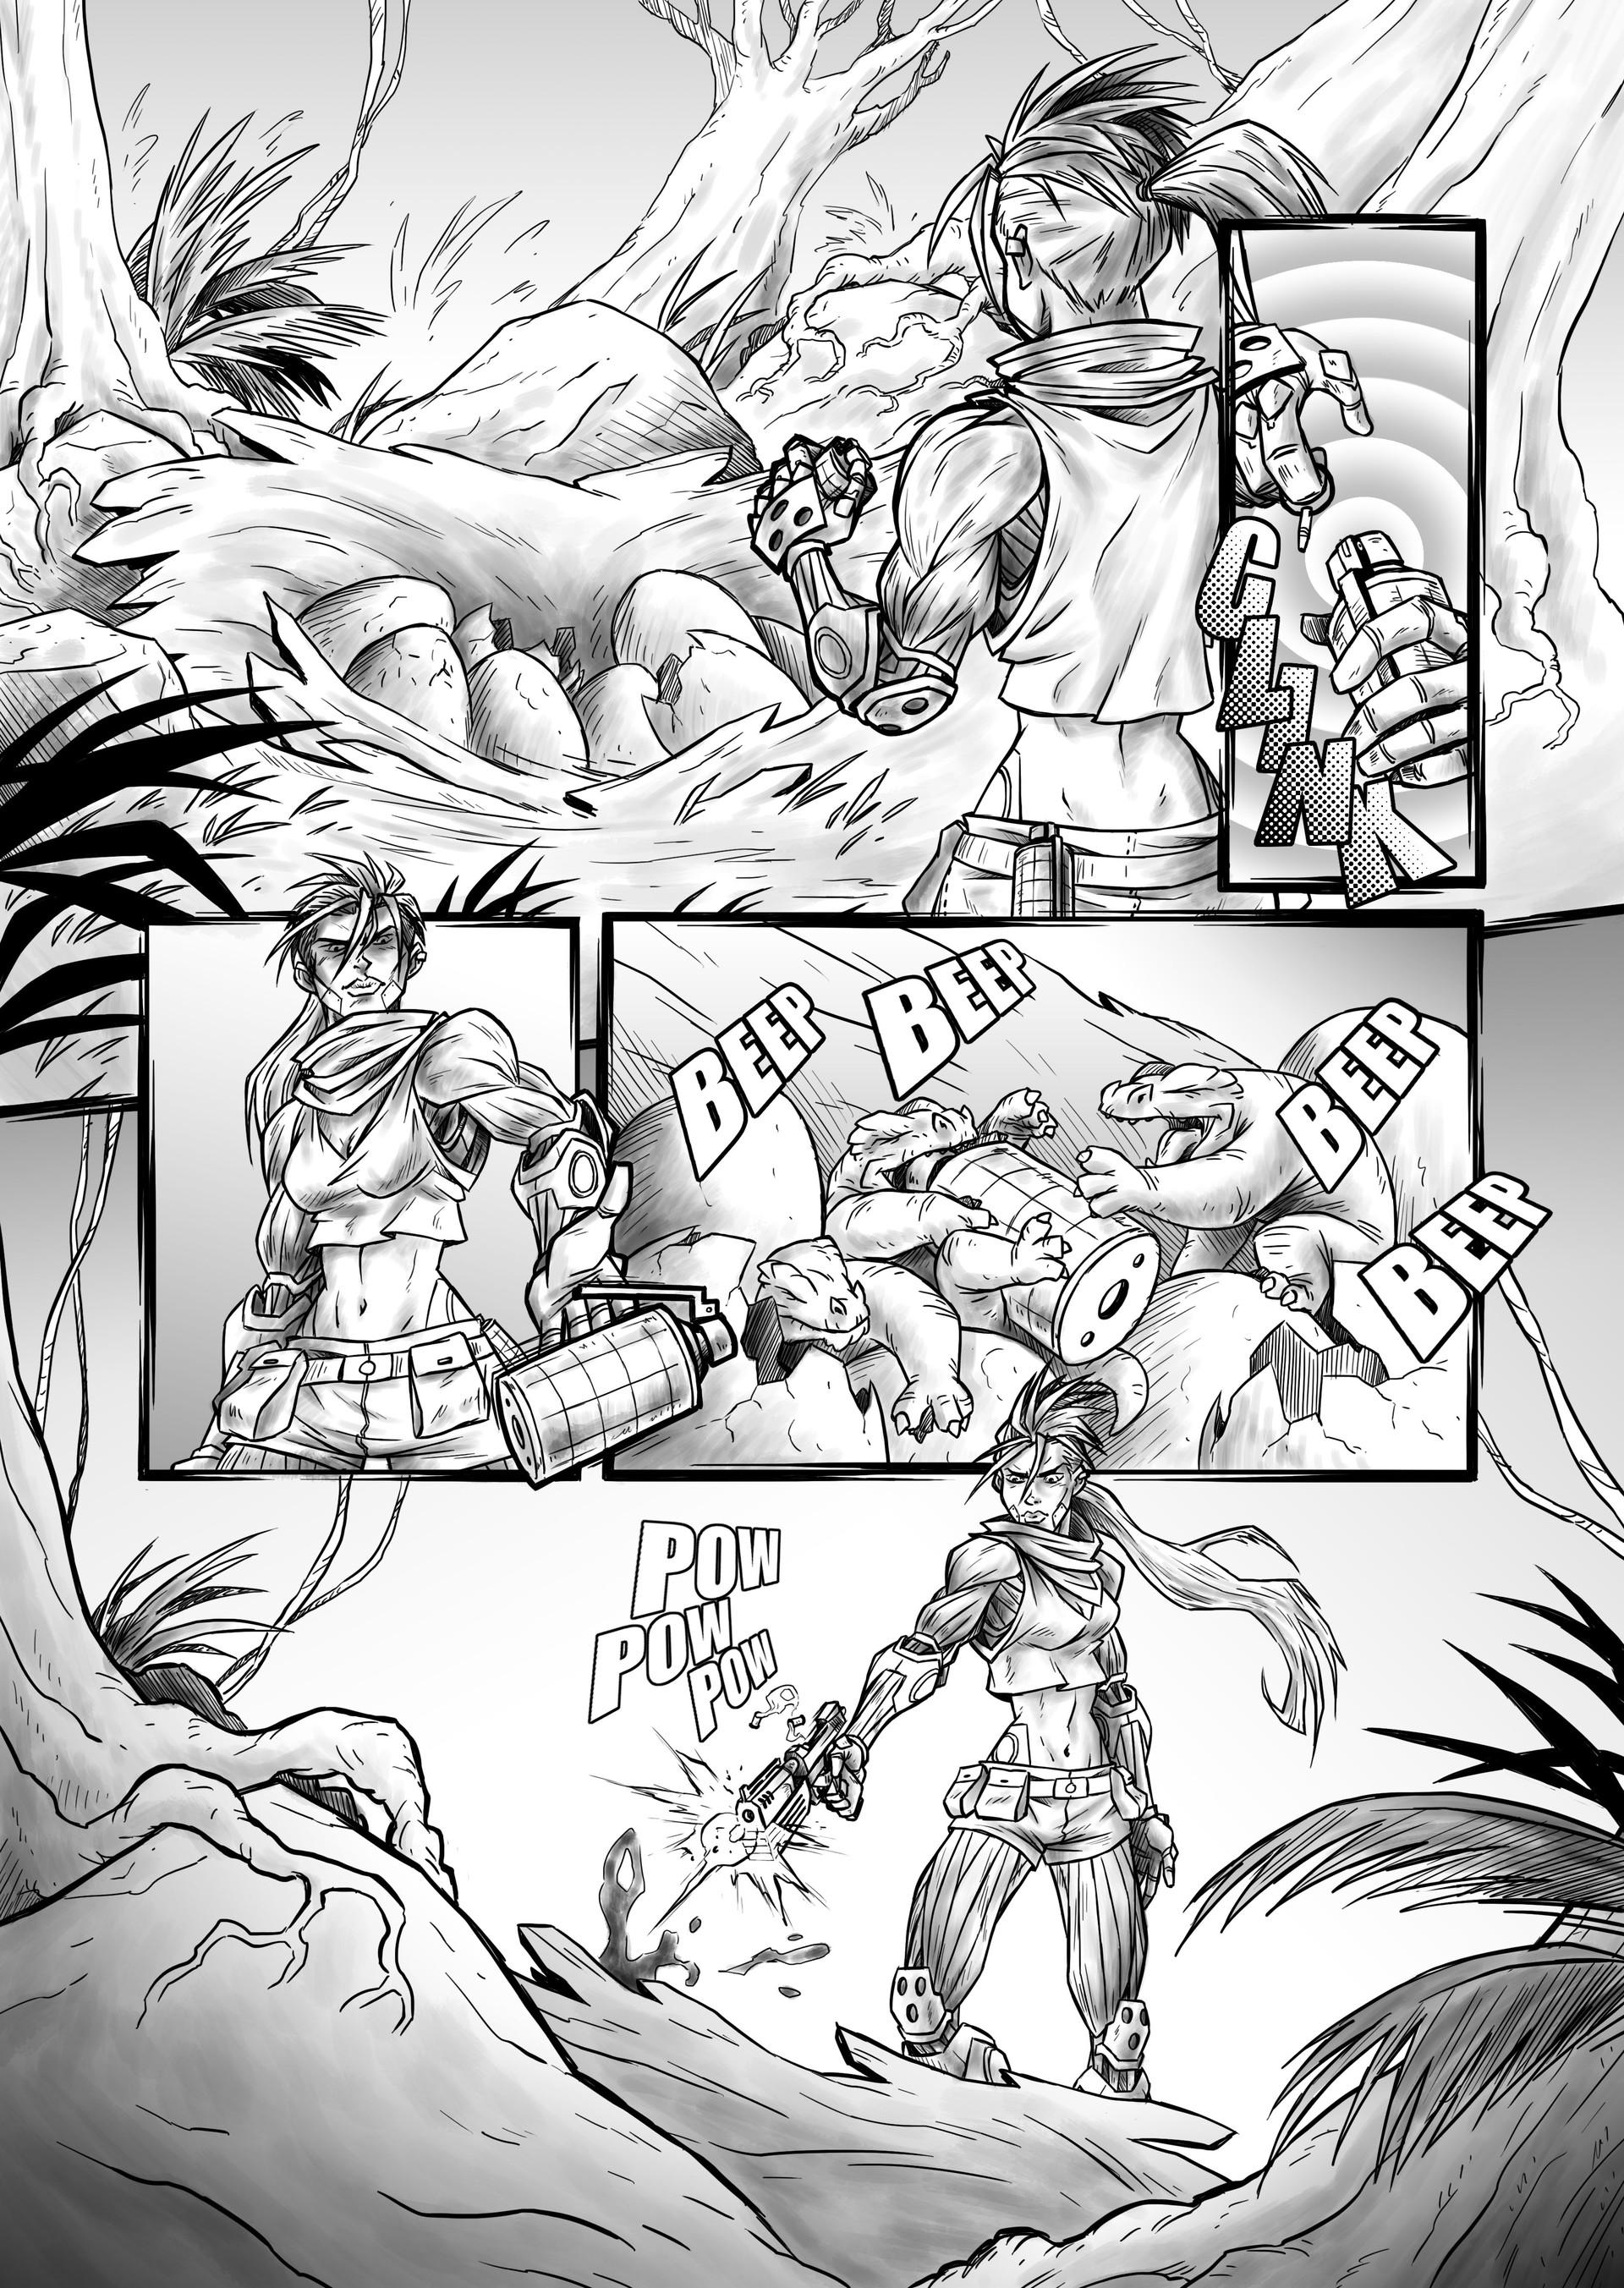 Max haig bounty huntrer page7